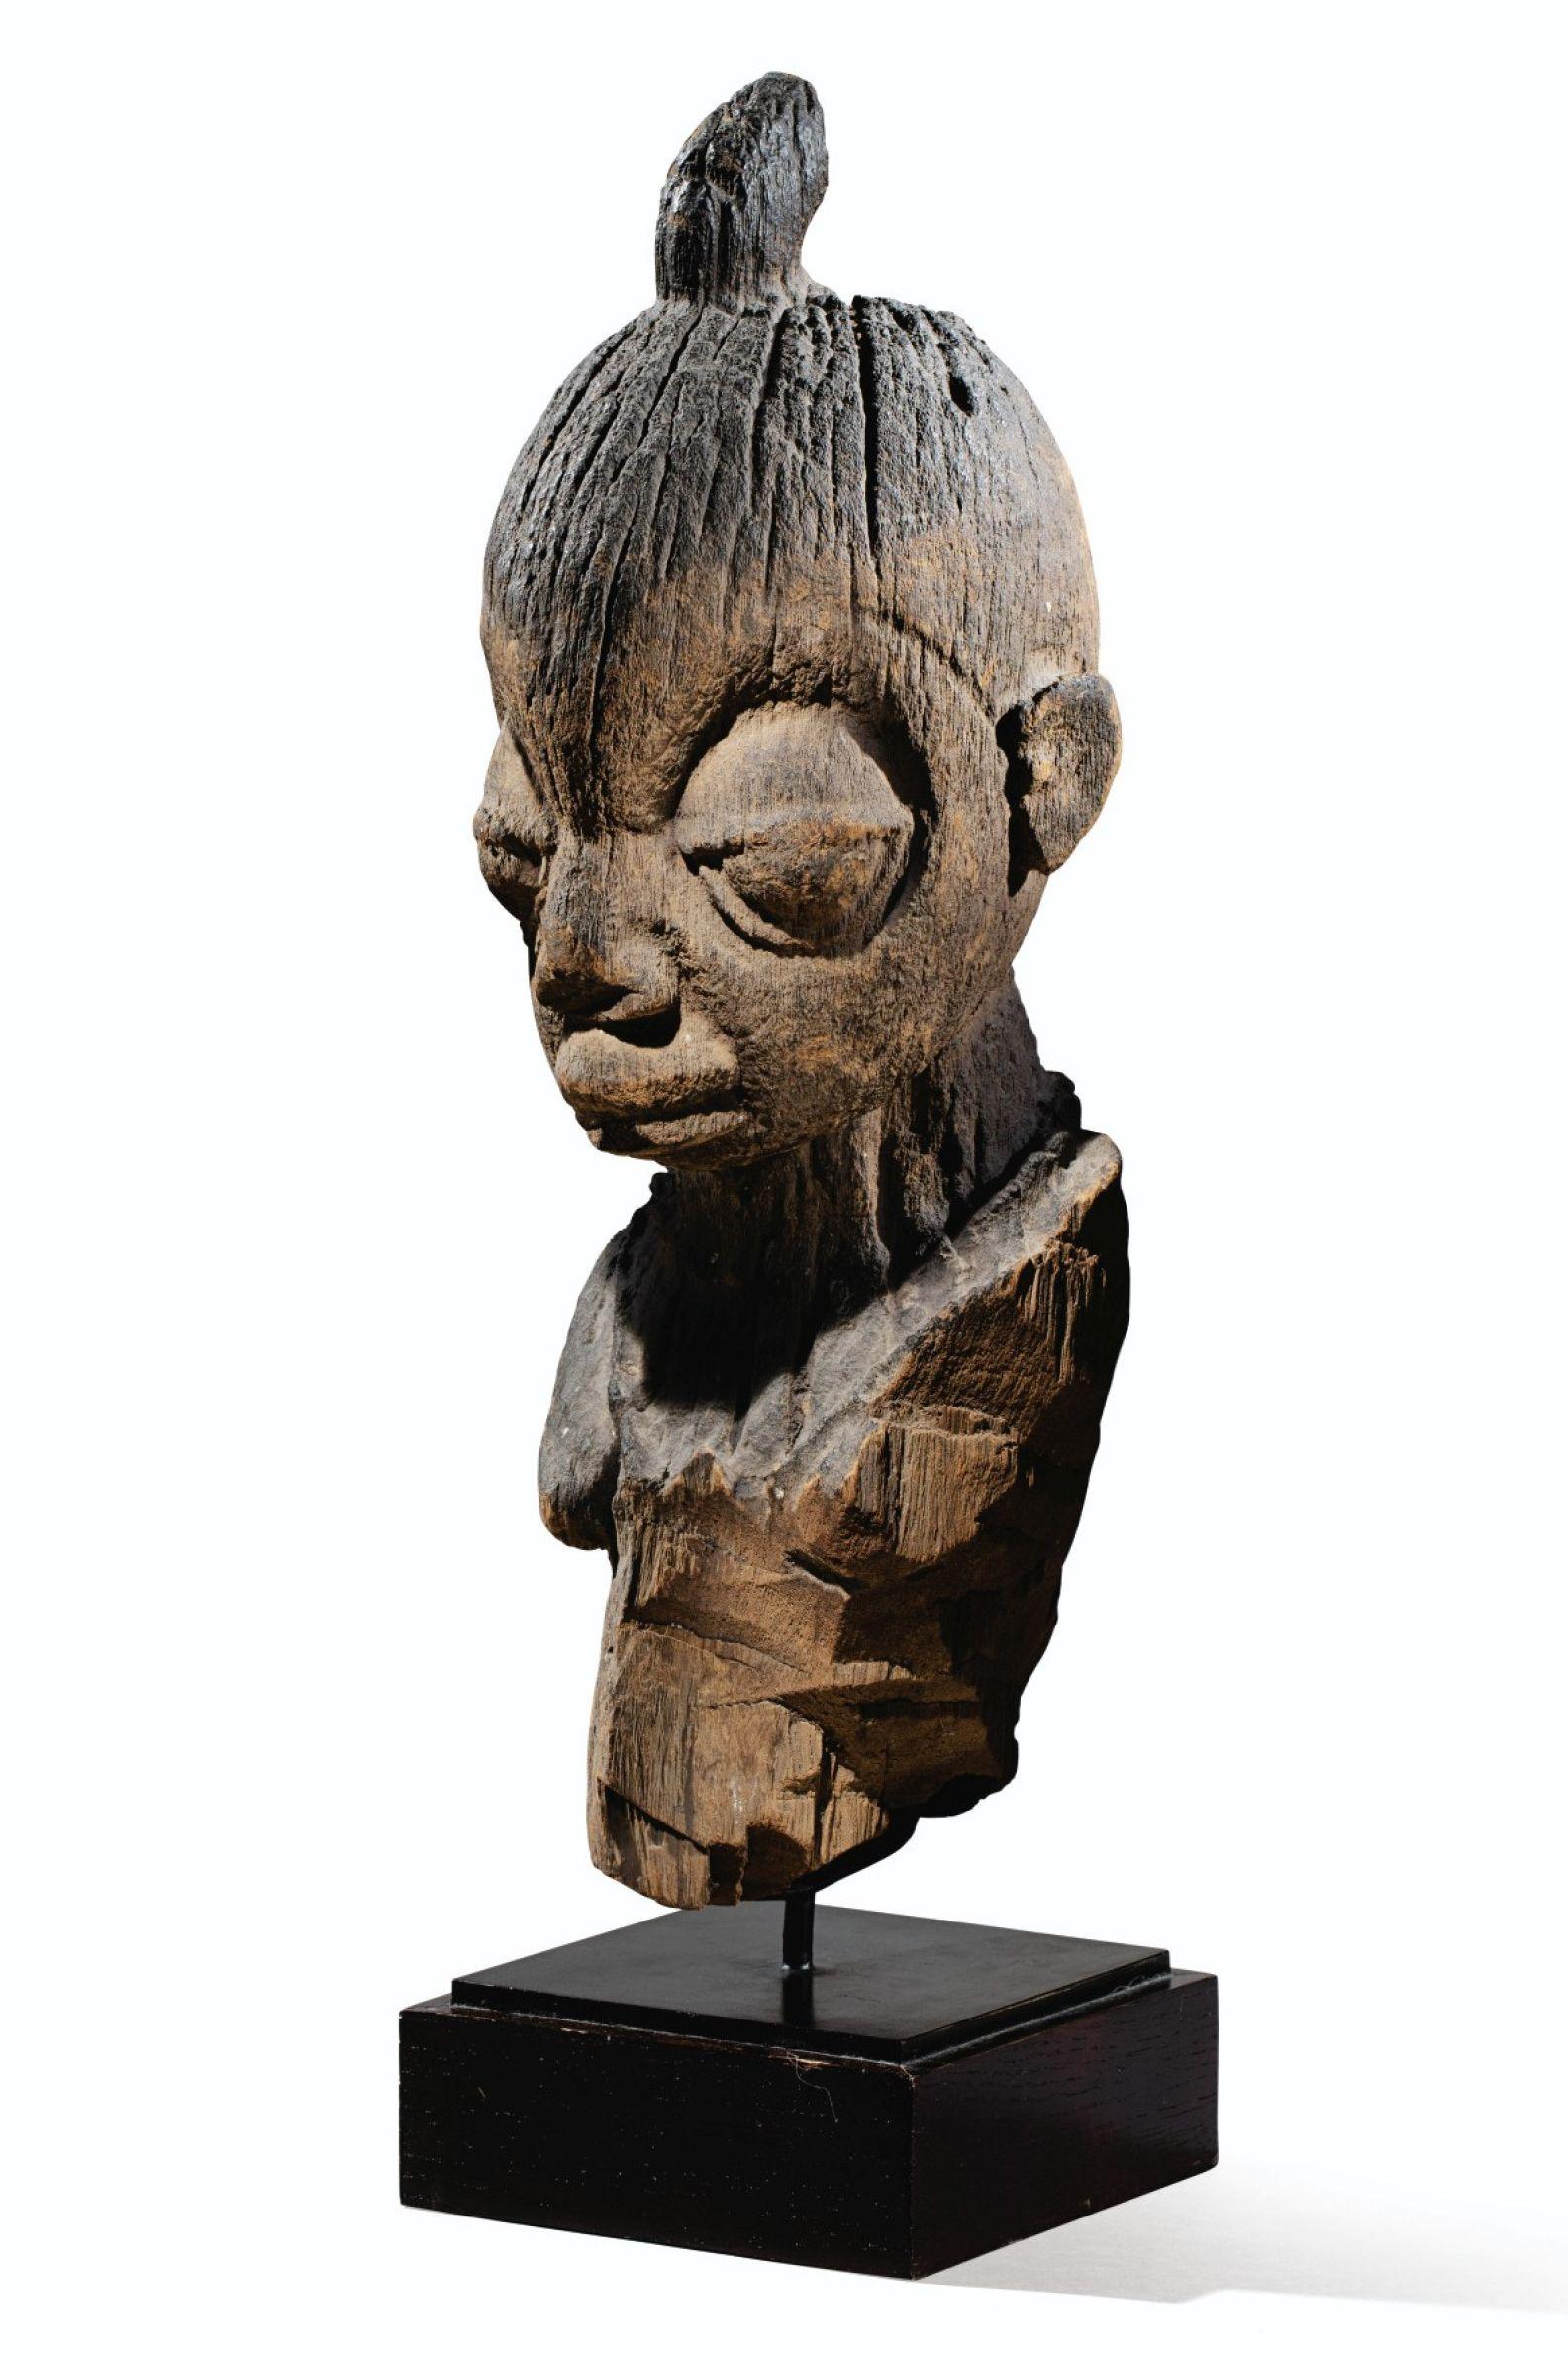 Sculpture: Secret Woman 11 (Peaceful Gentle Abstract Nude